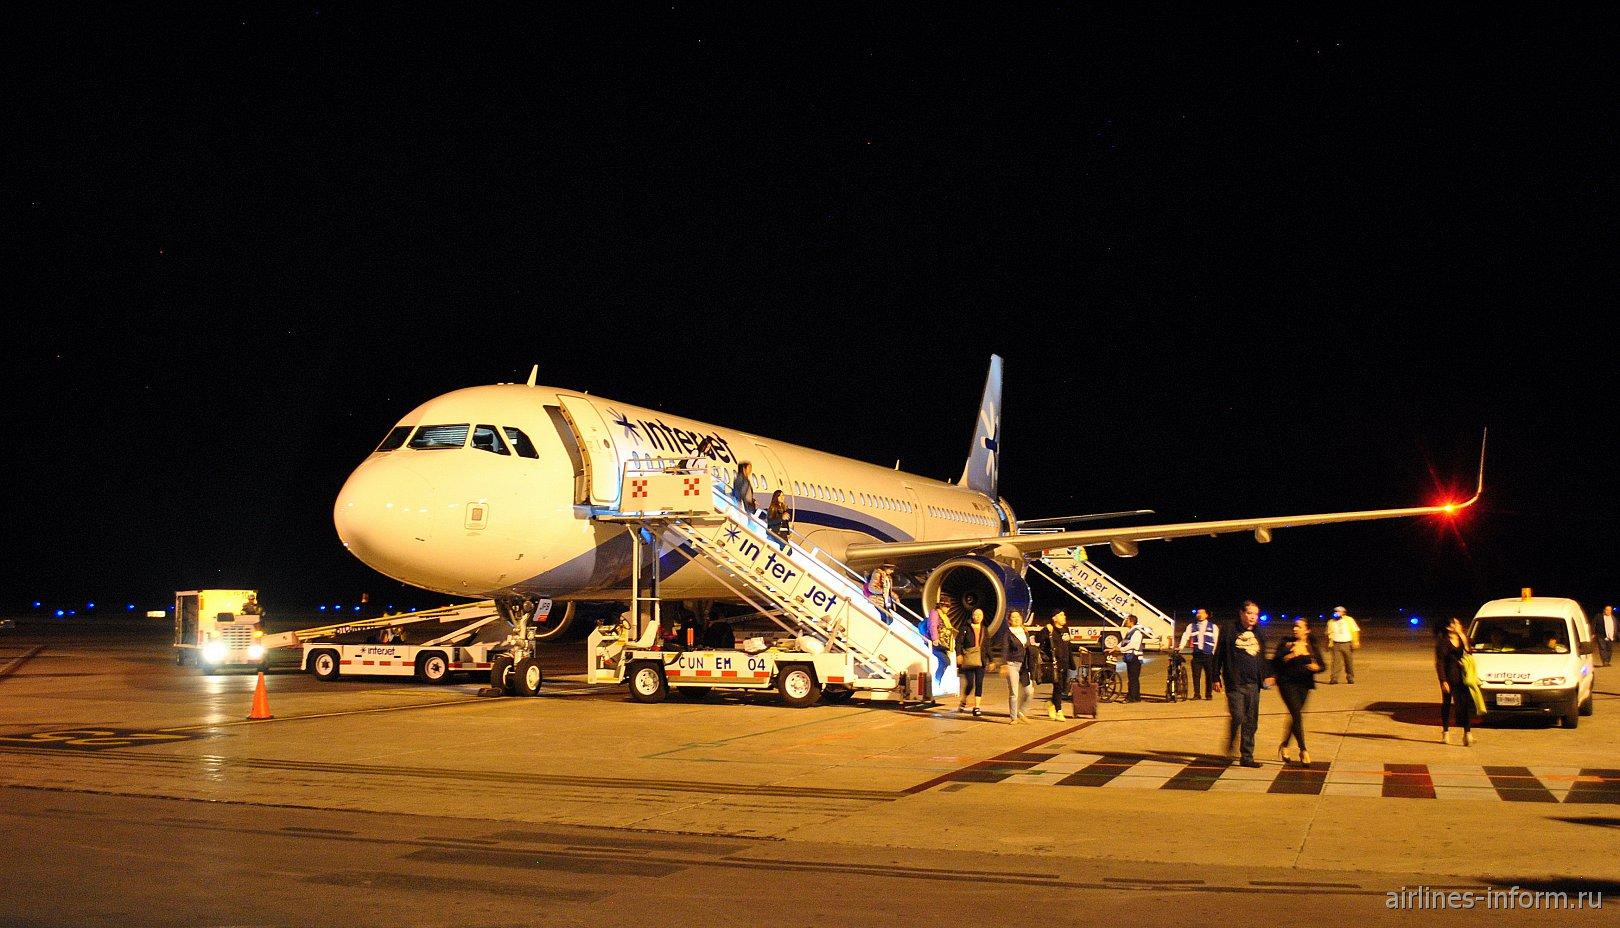 Podemos Soprenderte. Мехико Хуарес (MEX/T1) - Канкун (CUN/T2) Interjet 4O2322 на Airbus A321SL